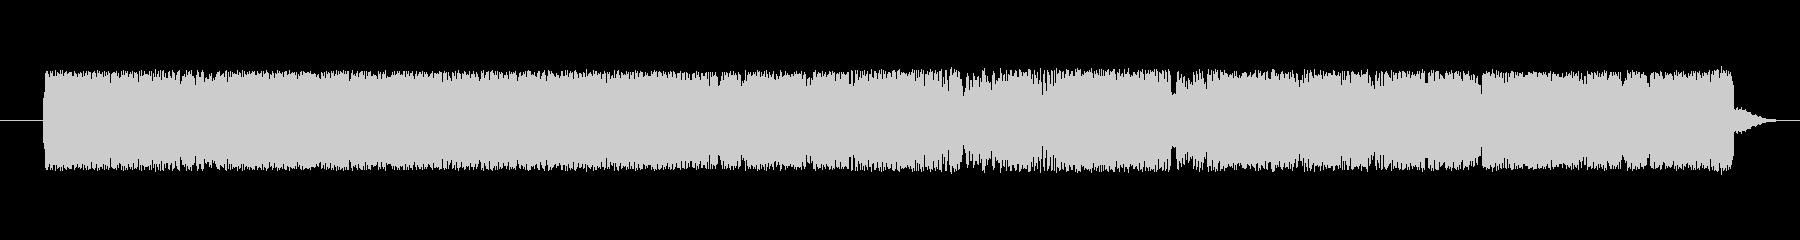 FX Ufoコミュニケーション01の未再生の波形